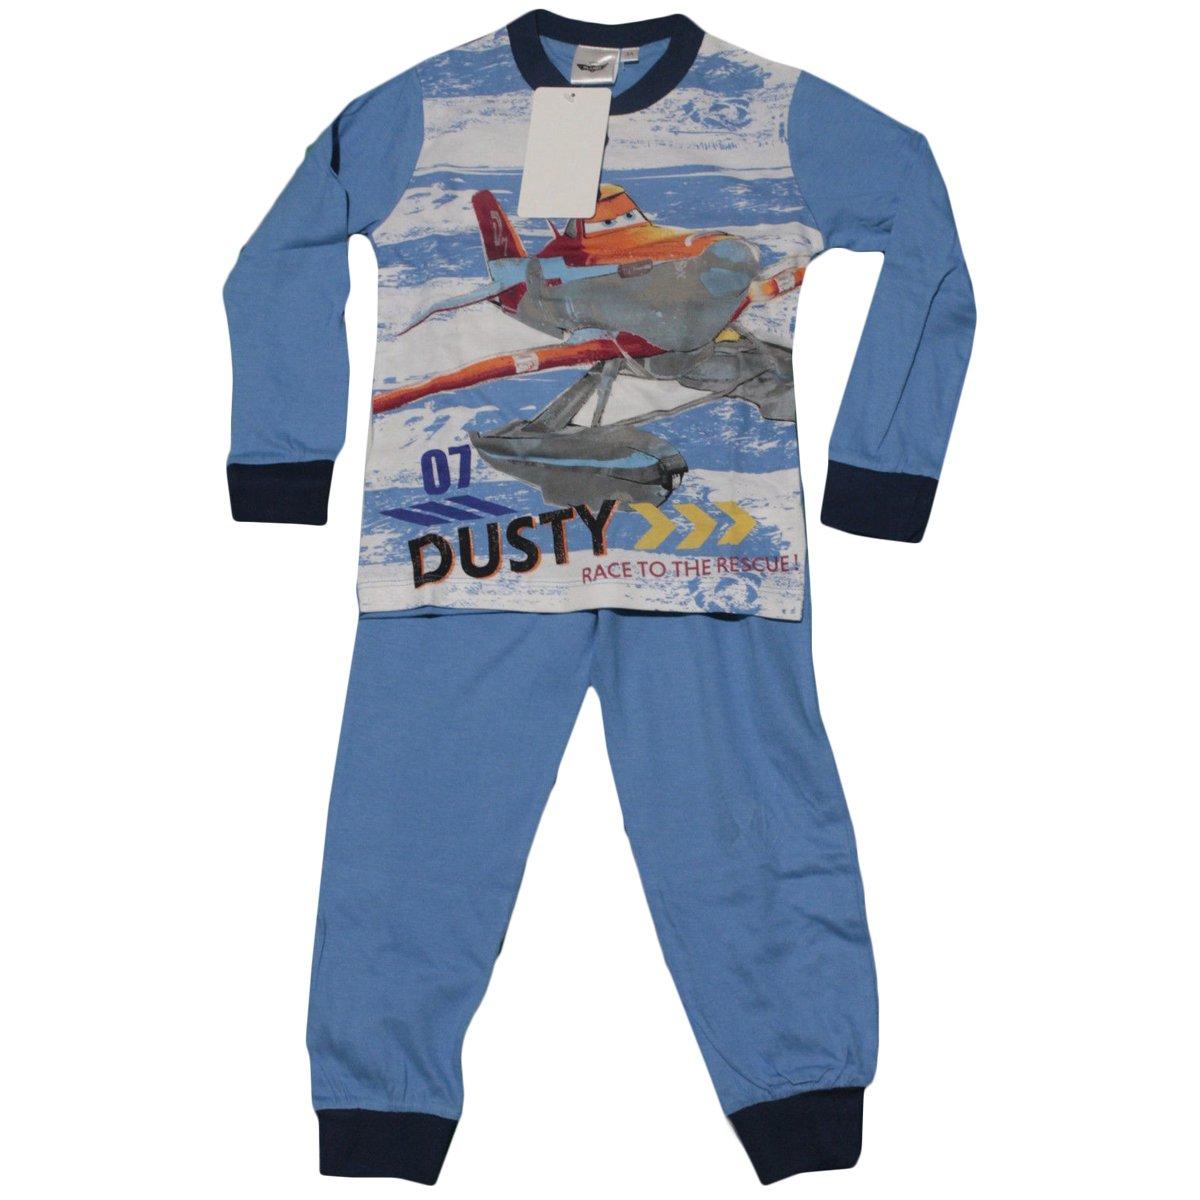 Ruso Tejidos Pijama Bimbo niño Chándal Disney Planes Dusty Pitufo ...